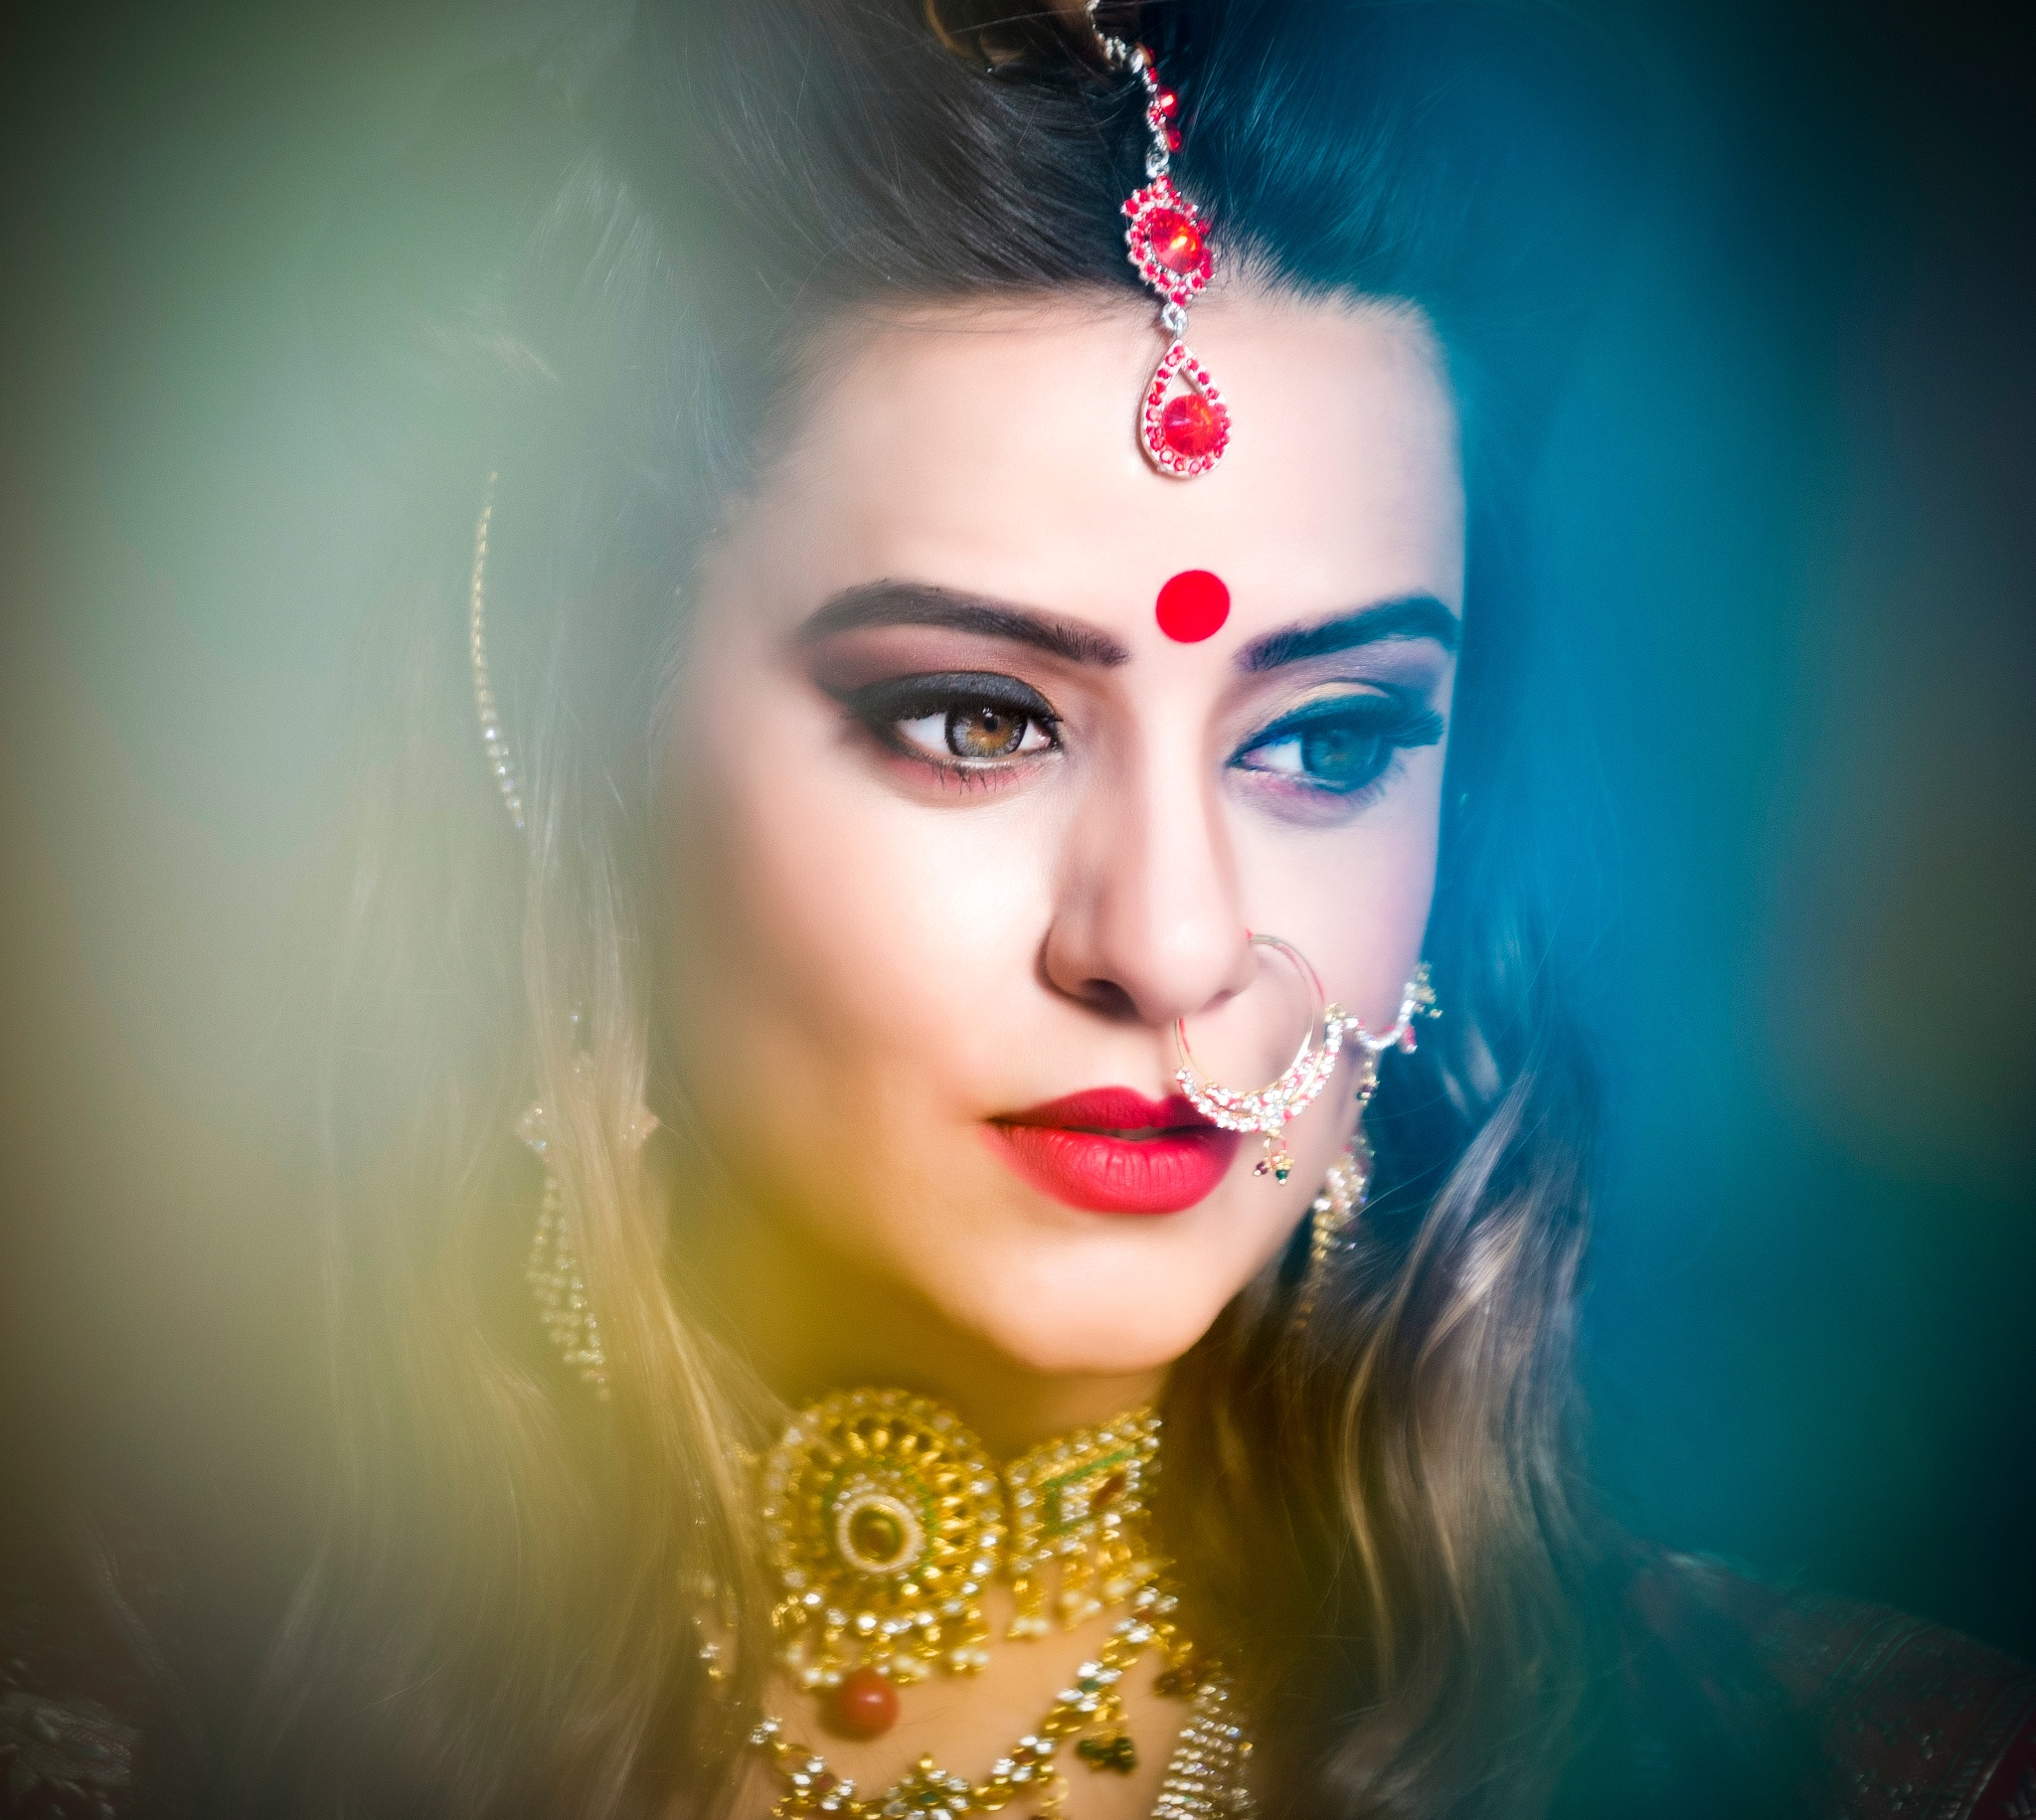 RUMA - The Bride by Pratap Ghosh